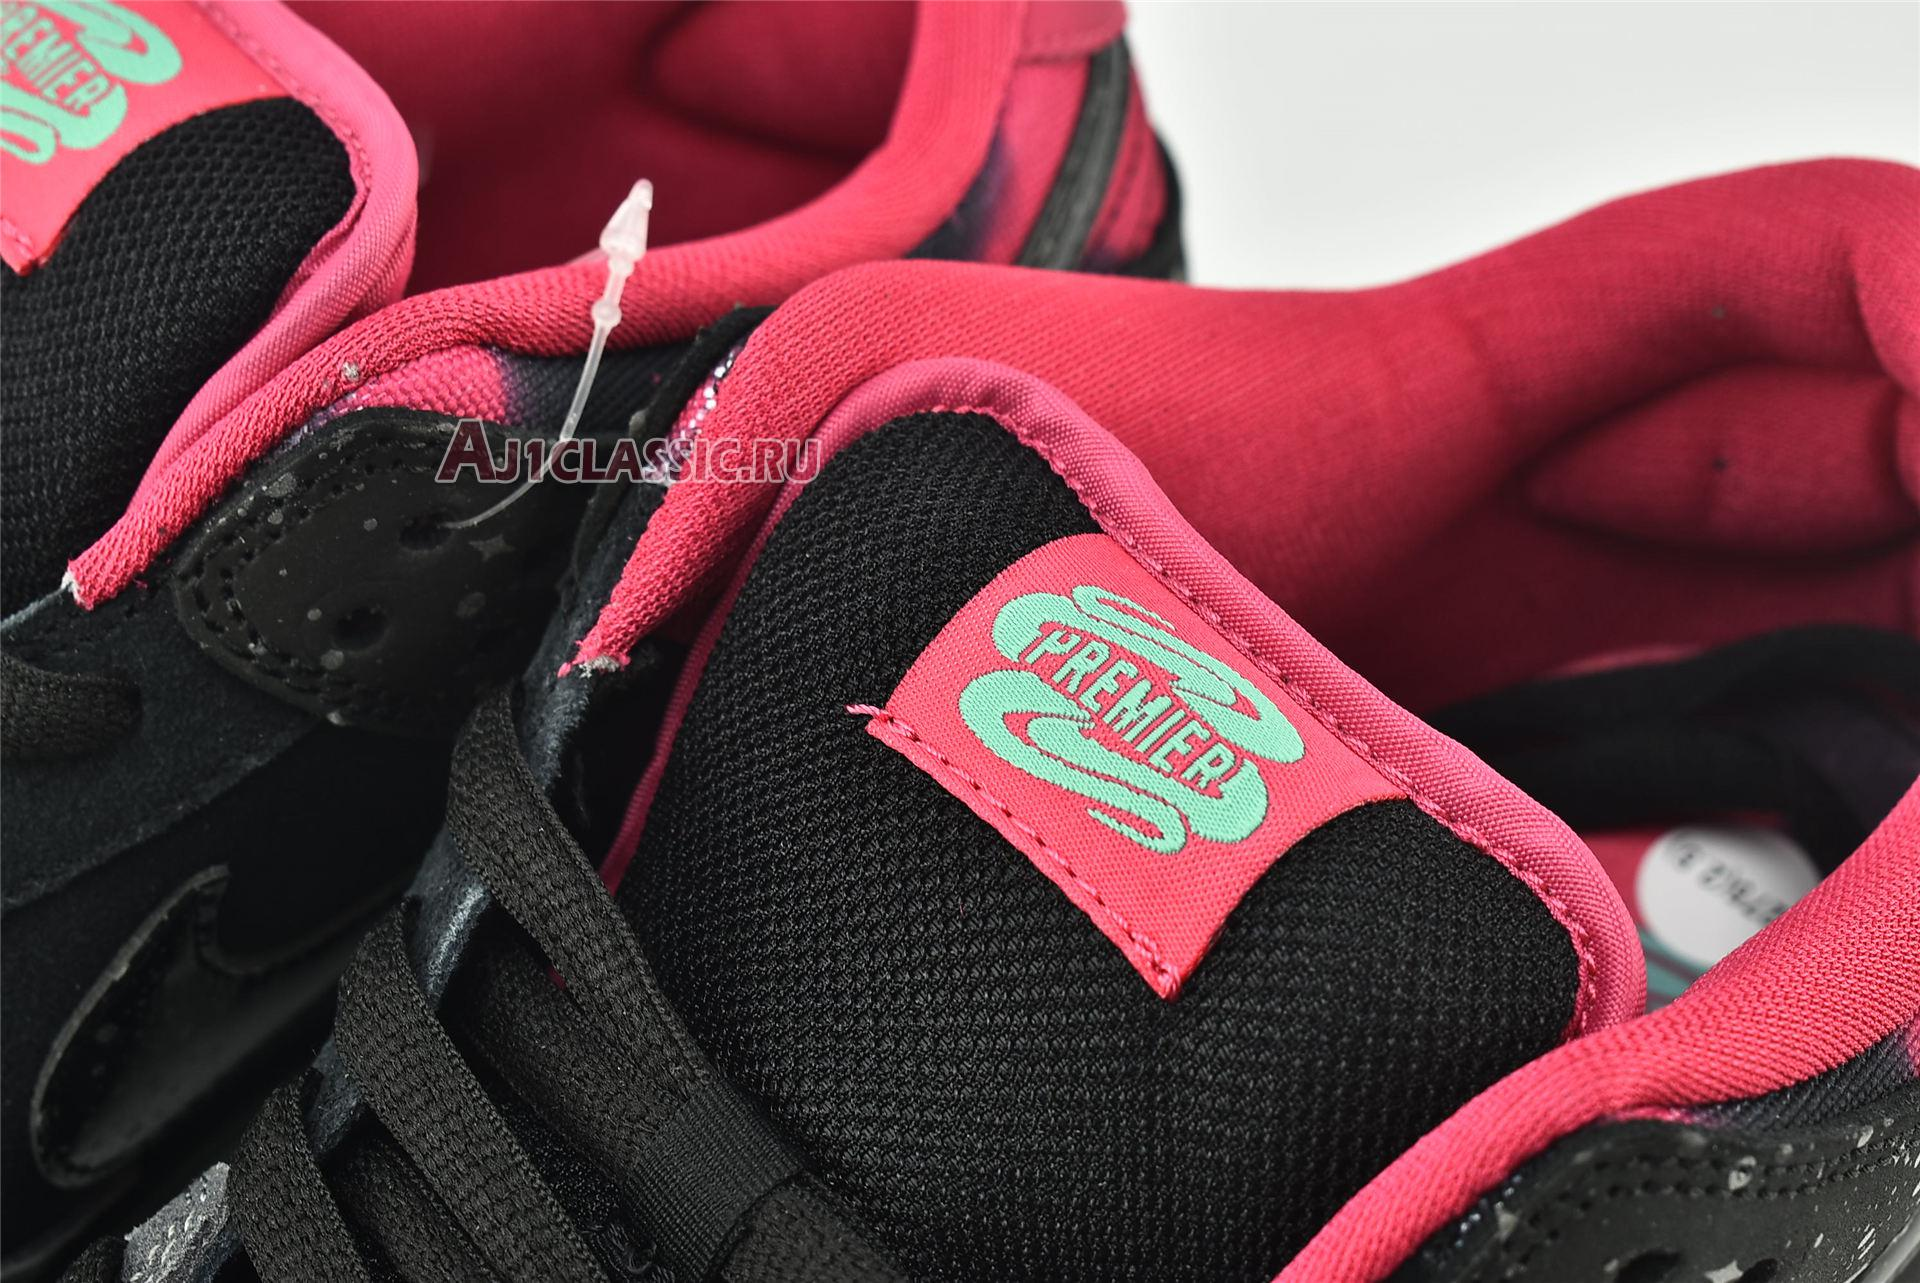 "Premier x Nike Dunk Low Premium SB AE QS ""Northern Lights"" 724183-063"